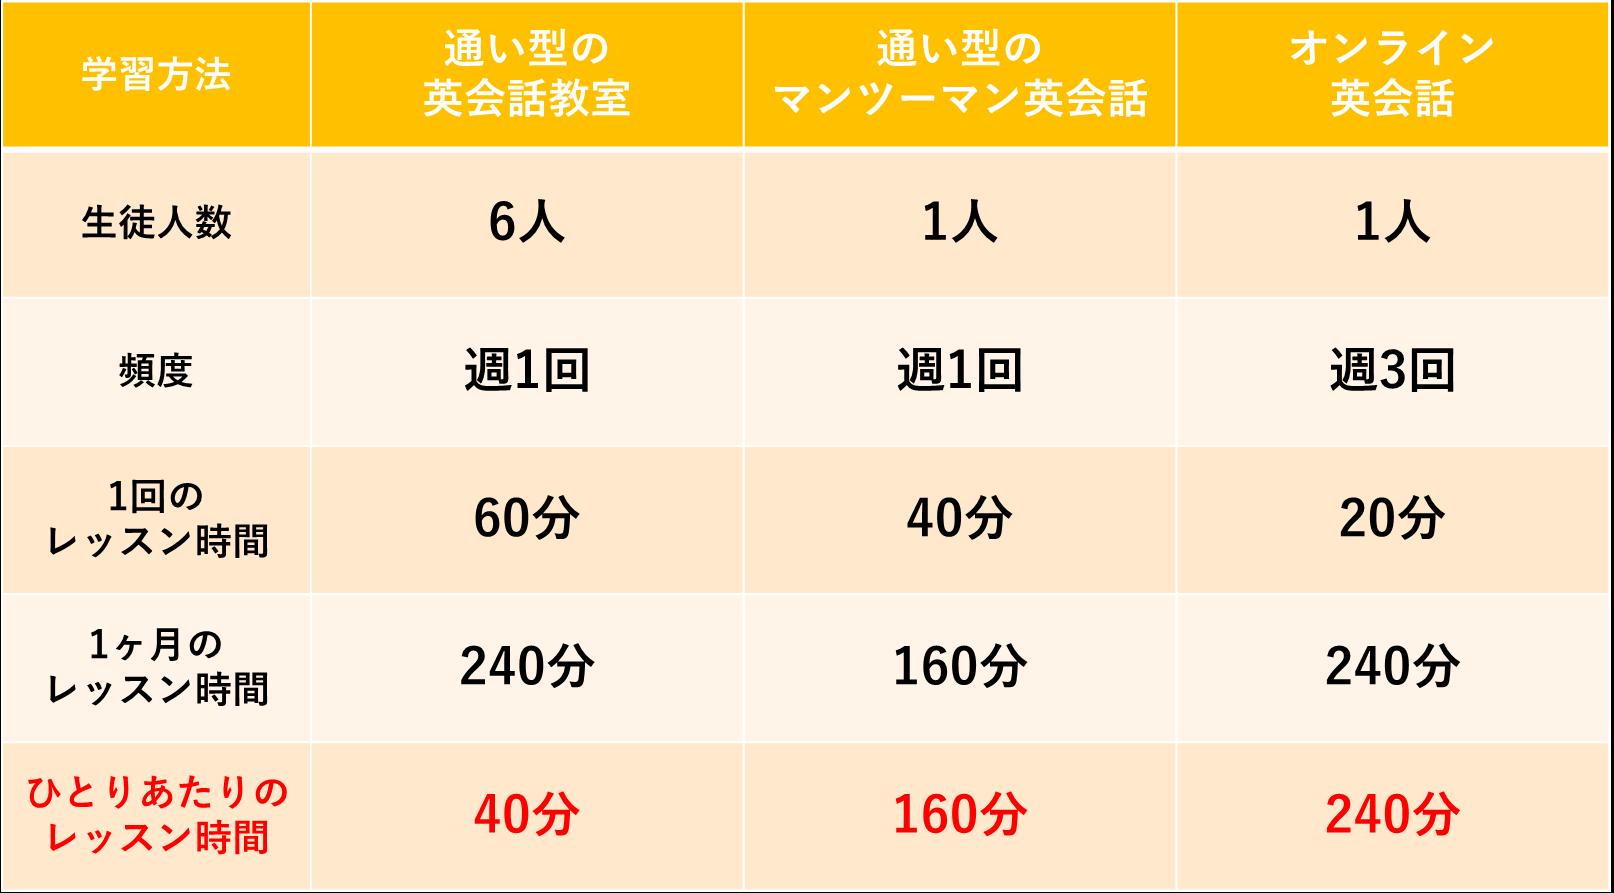 %e3%81%b2%e3%81%a8%e3%82%8a%e3%81%82%e3%81%9f%e3%82%8a%e3%81%ae%e3%83%ac%e3%83%83%e3%82%b9%e3%83%b3%e6%99%82%e9%96%93